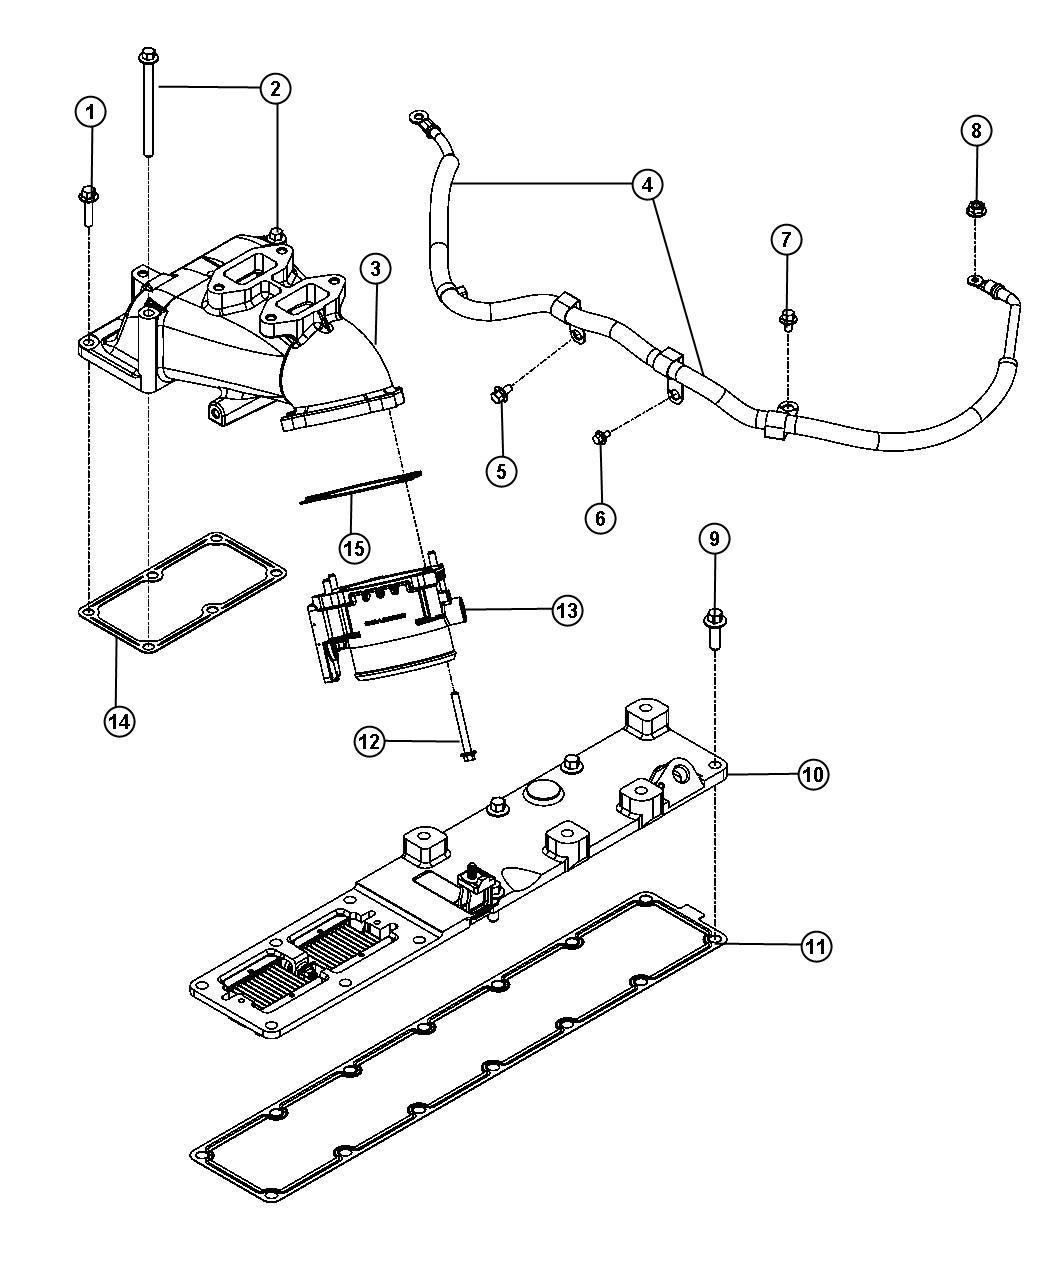 Dodge Ram 3500 Plenum. Intake manifold. [federal emissions